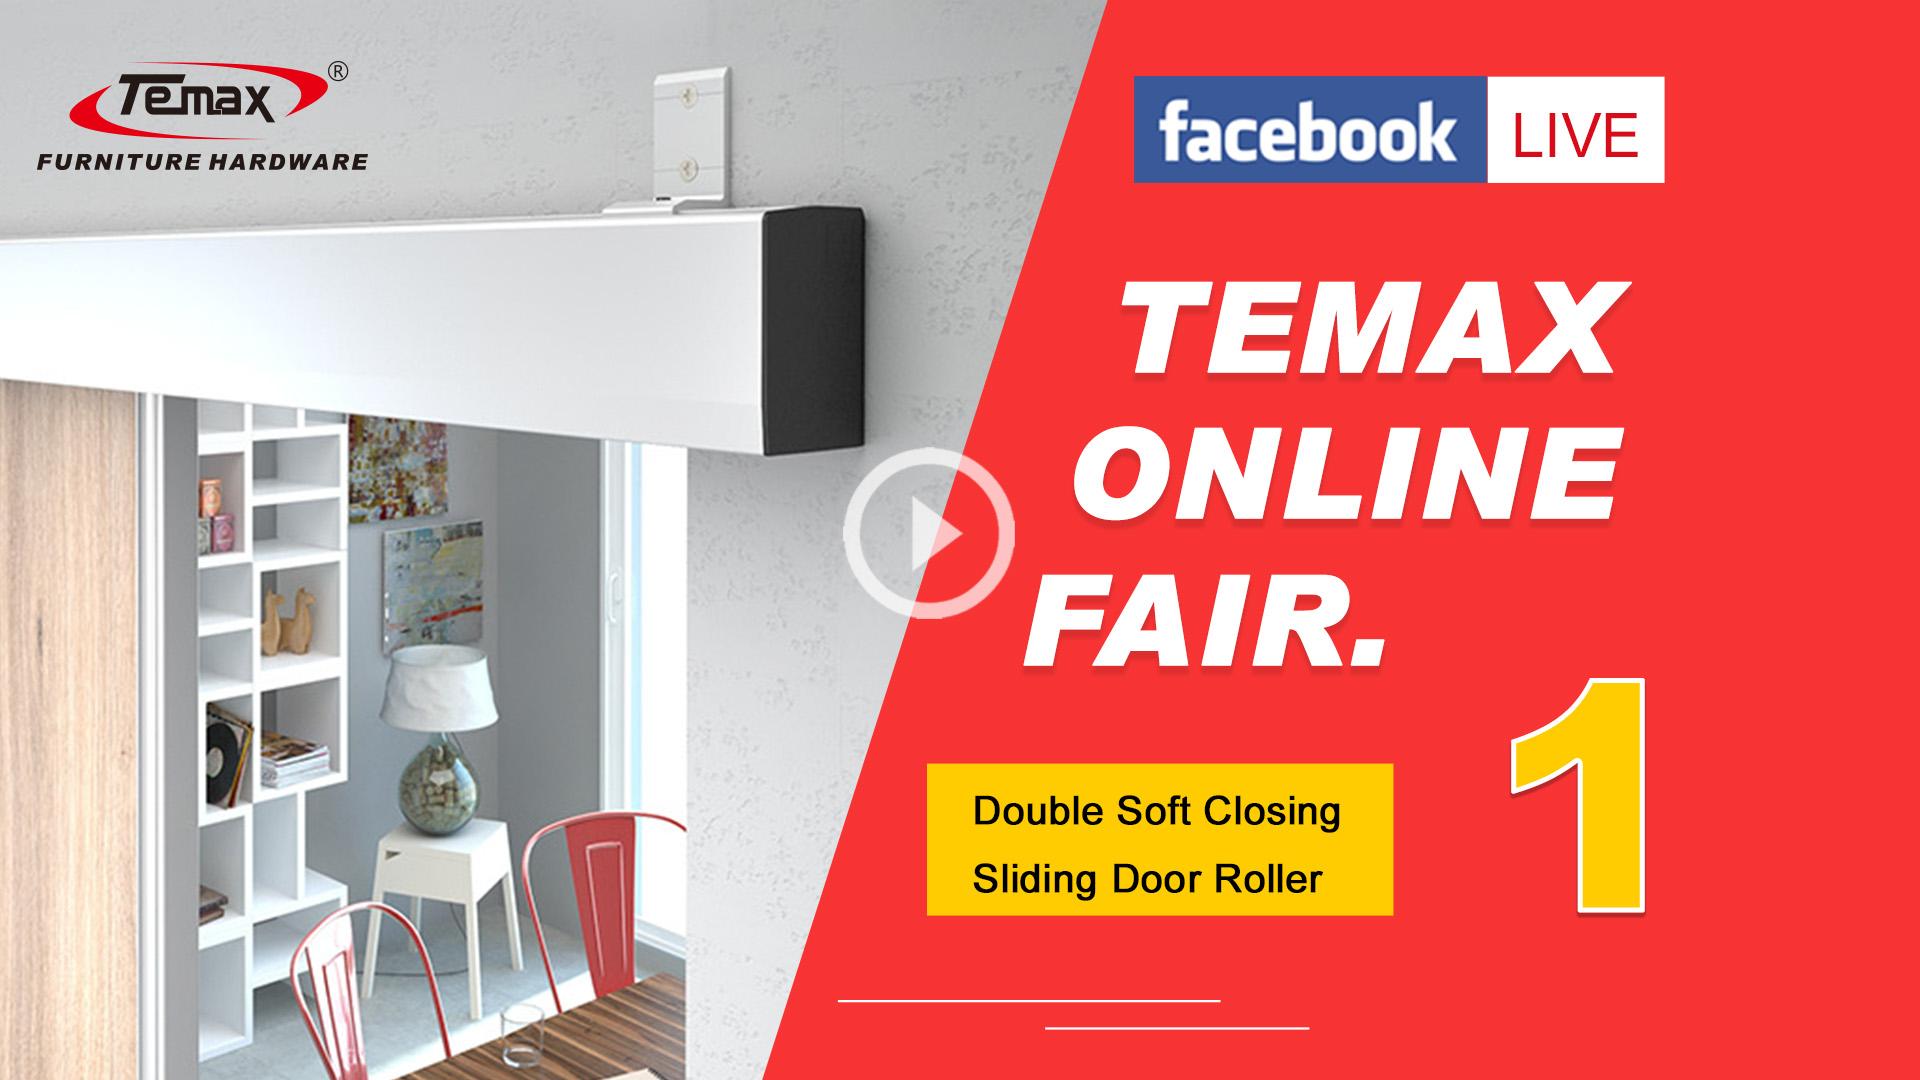 Facebook live double soft closing sliding door roller 1